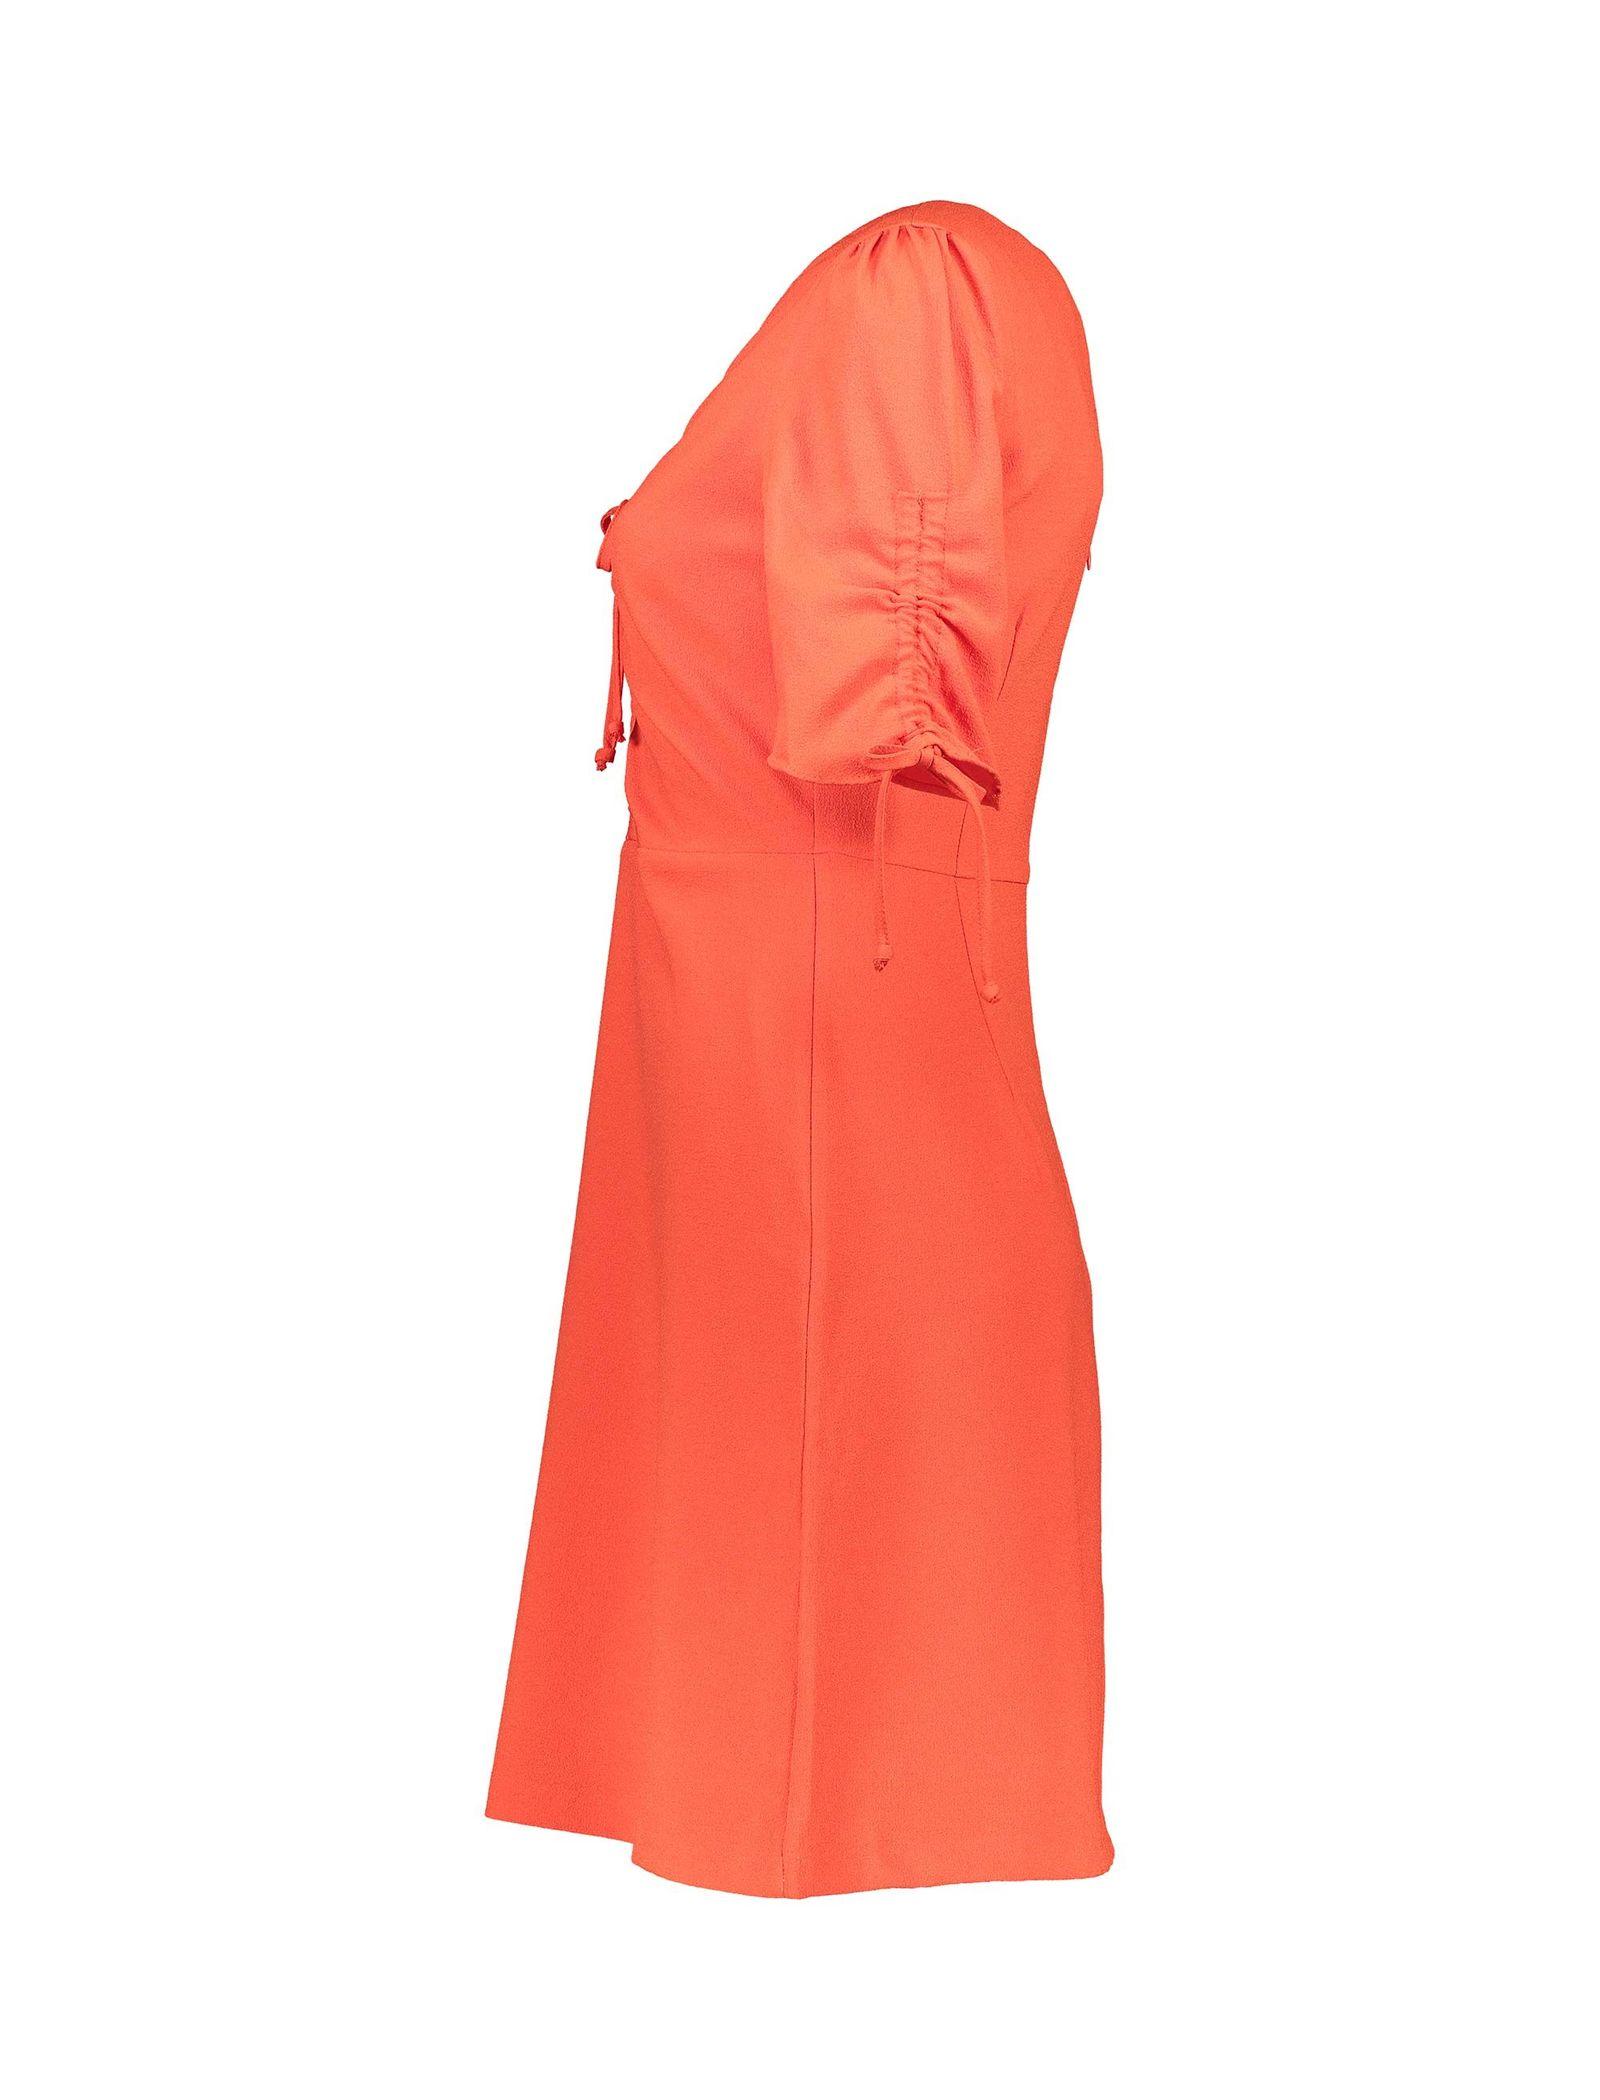 پیراهن کوتاه زنانه - کوتون - قرمز - 4